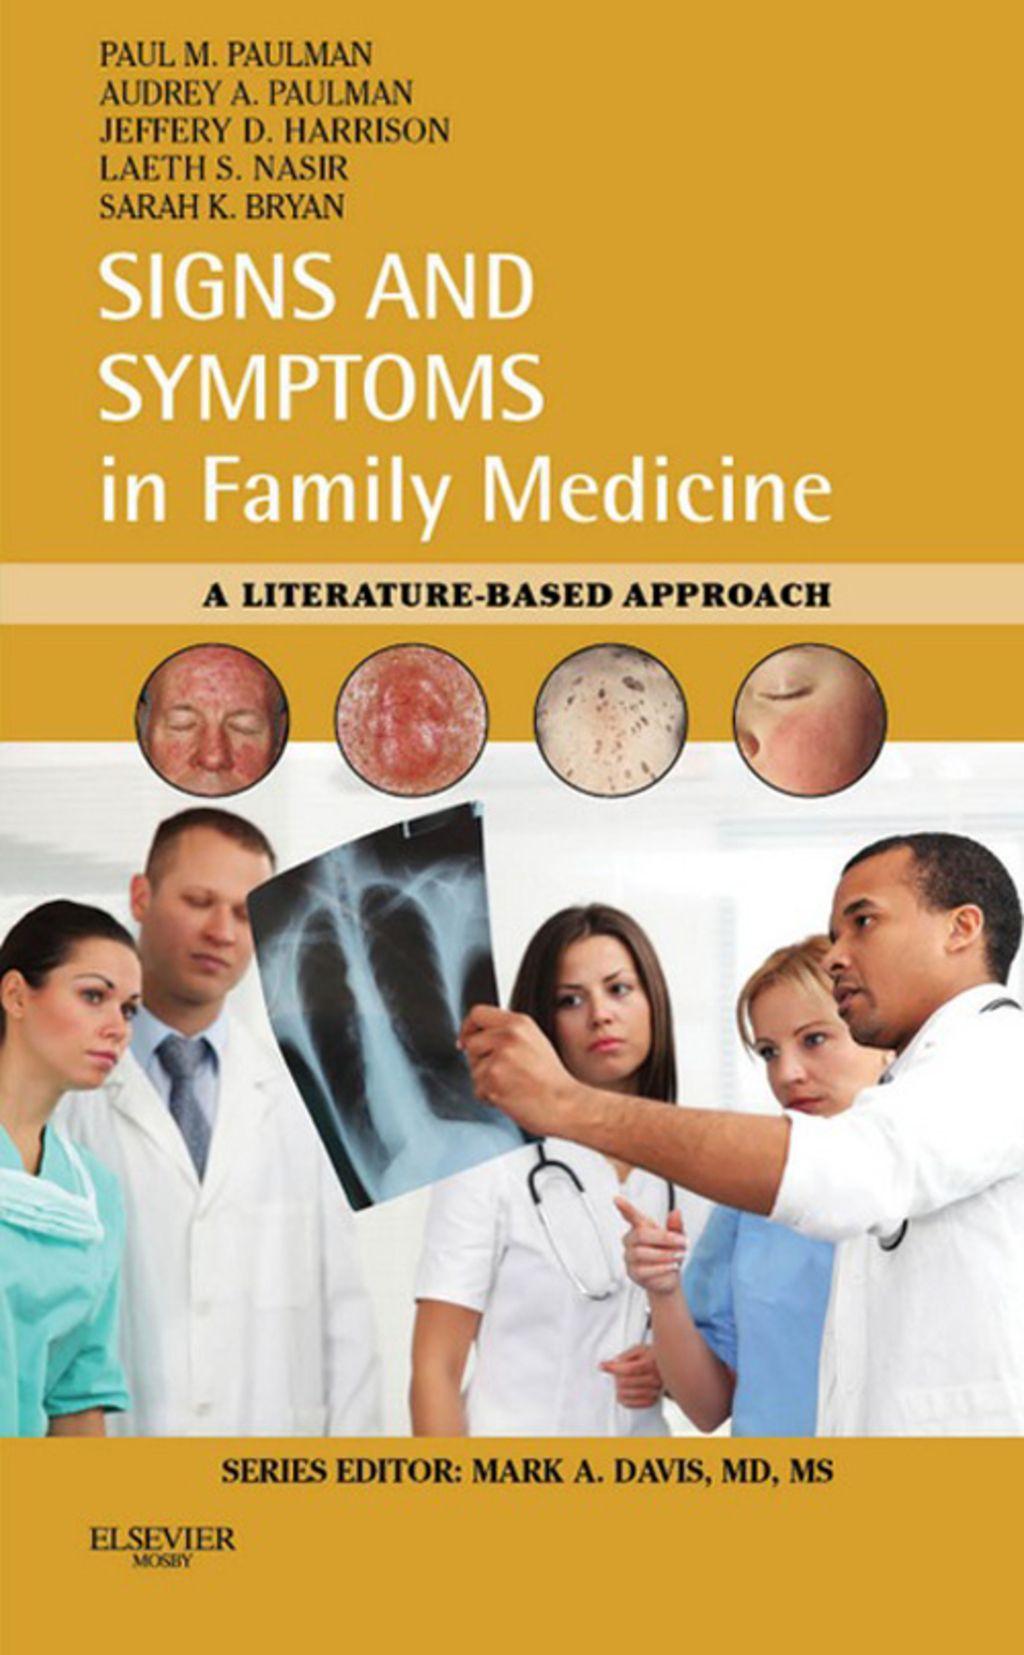 Signs And Symptoms In Family Medicine E Book Ebook Rental In